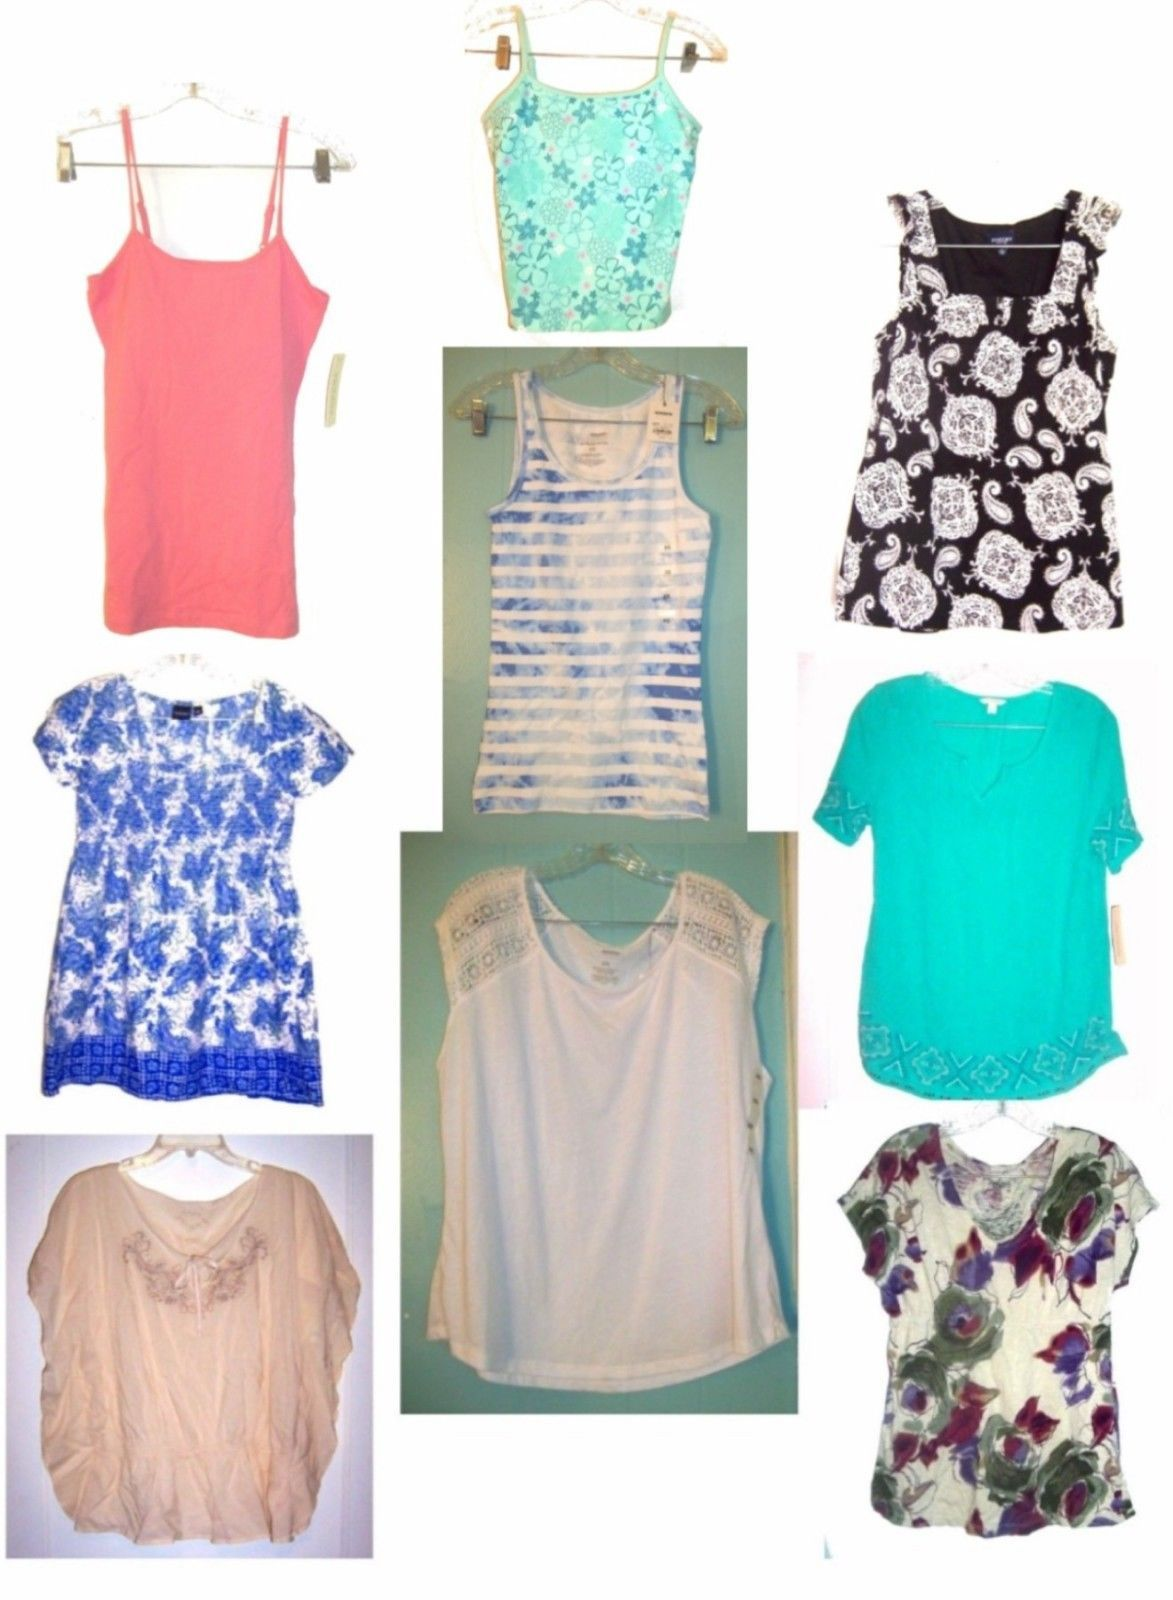 Size XS - 2X - Sonoma Sleeveless, Cap Sleeve & Short Sleeve Spring & Summer Tops - $21.37 - $29.92